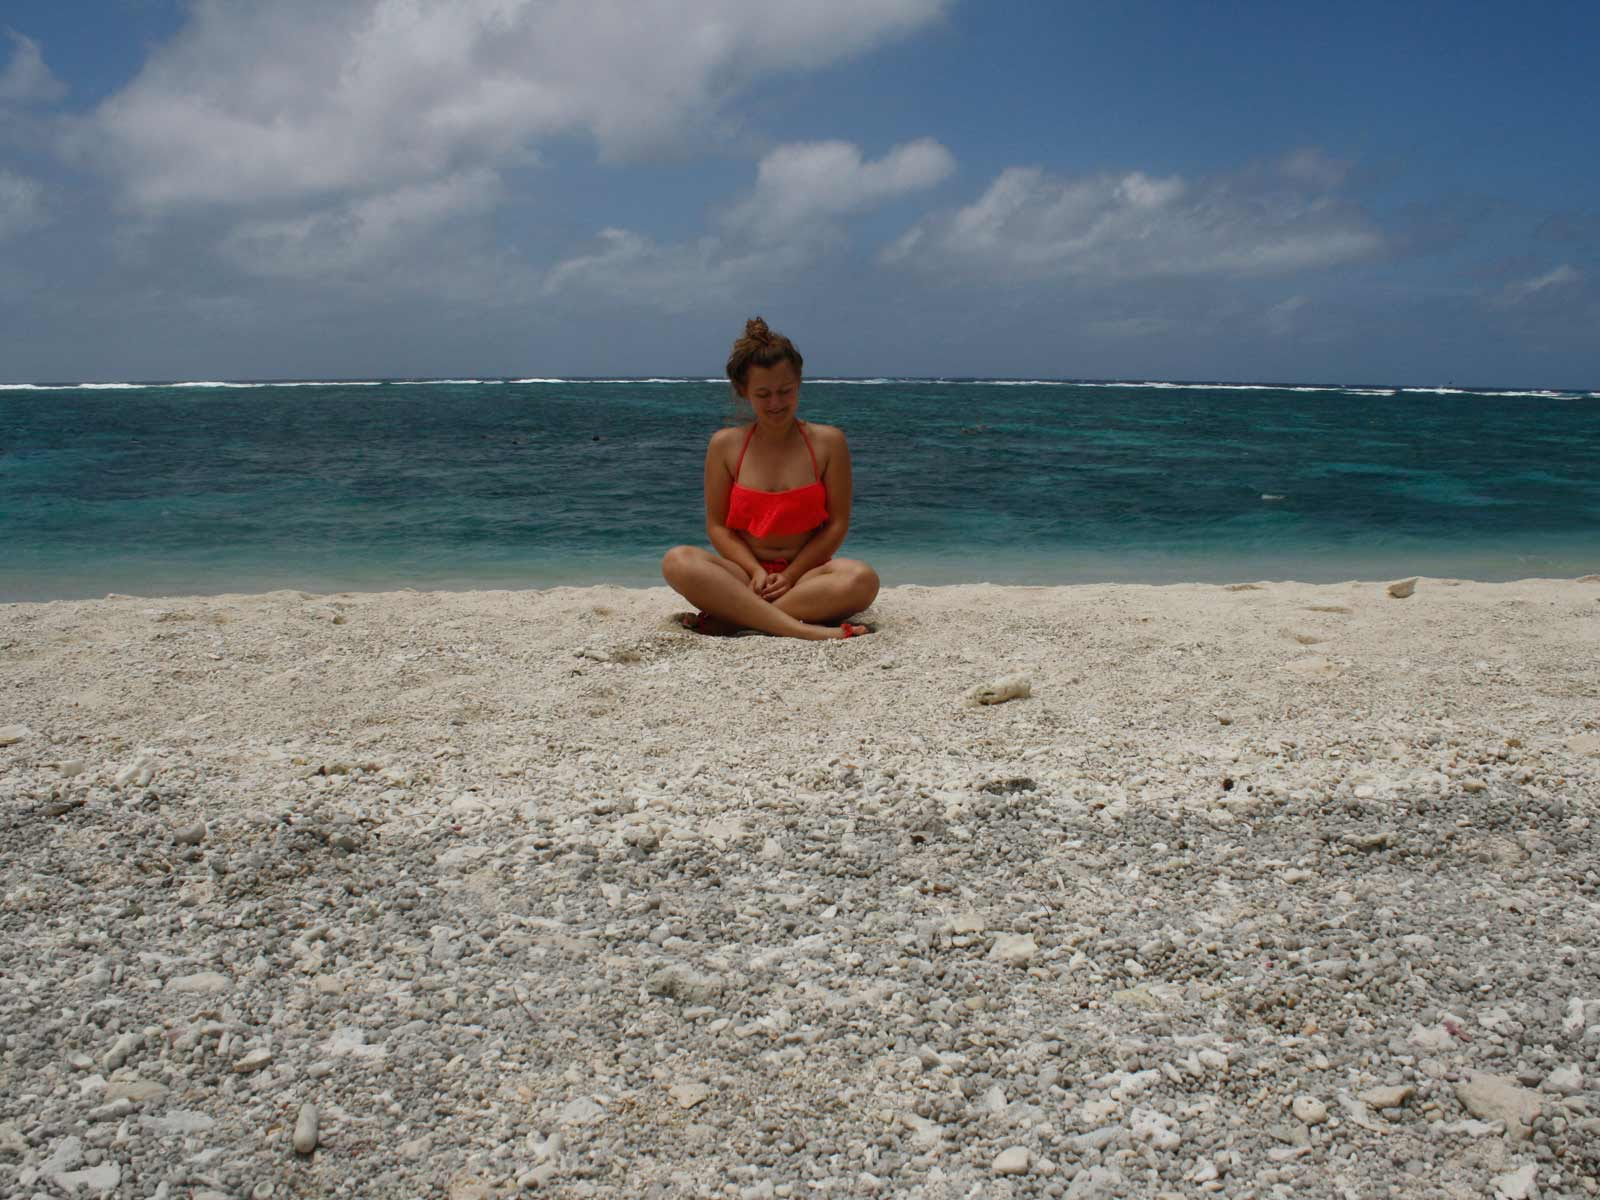 Lena am Korallenstrand auf Lady Elliot Island